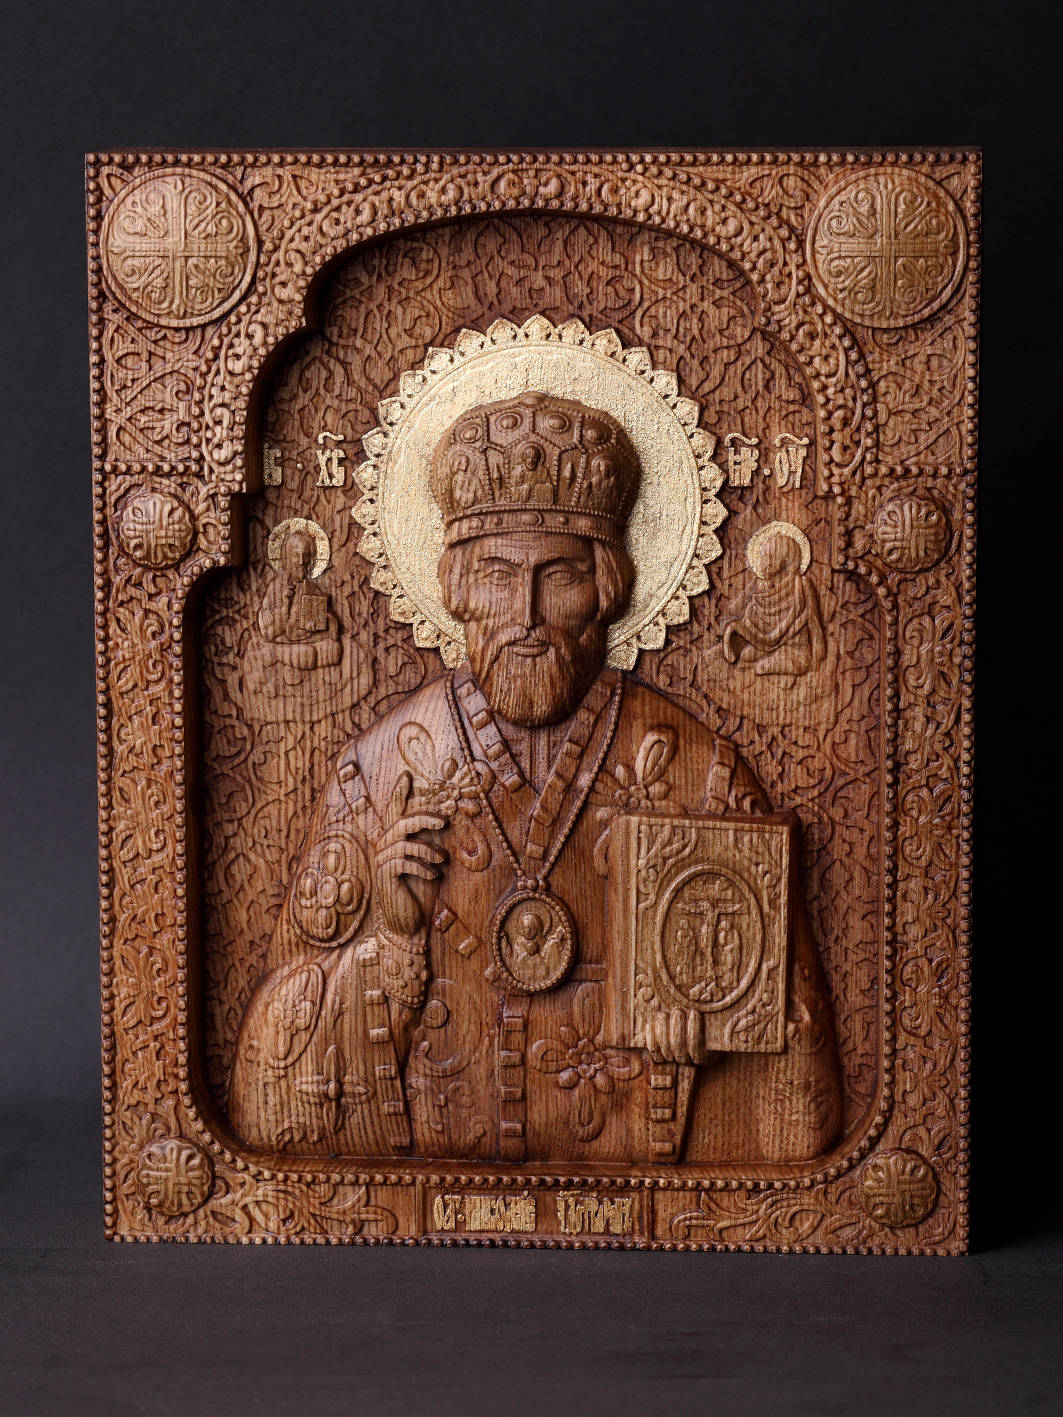 Св. Николай Чудотворец . Материал дерево ясень.Сусальное золото,воски. Размер 17х21см